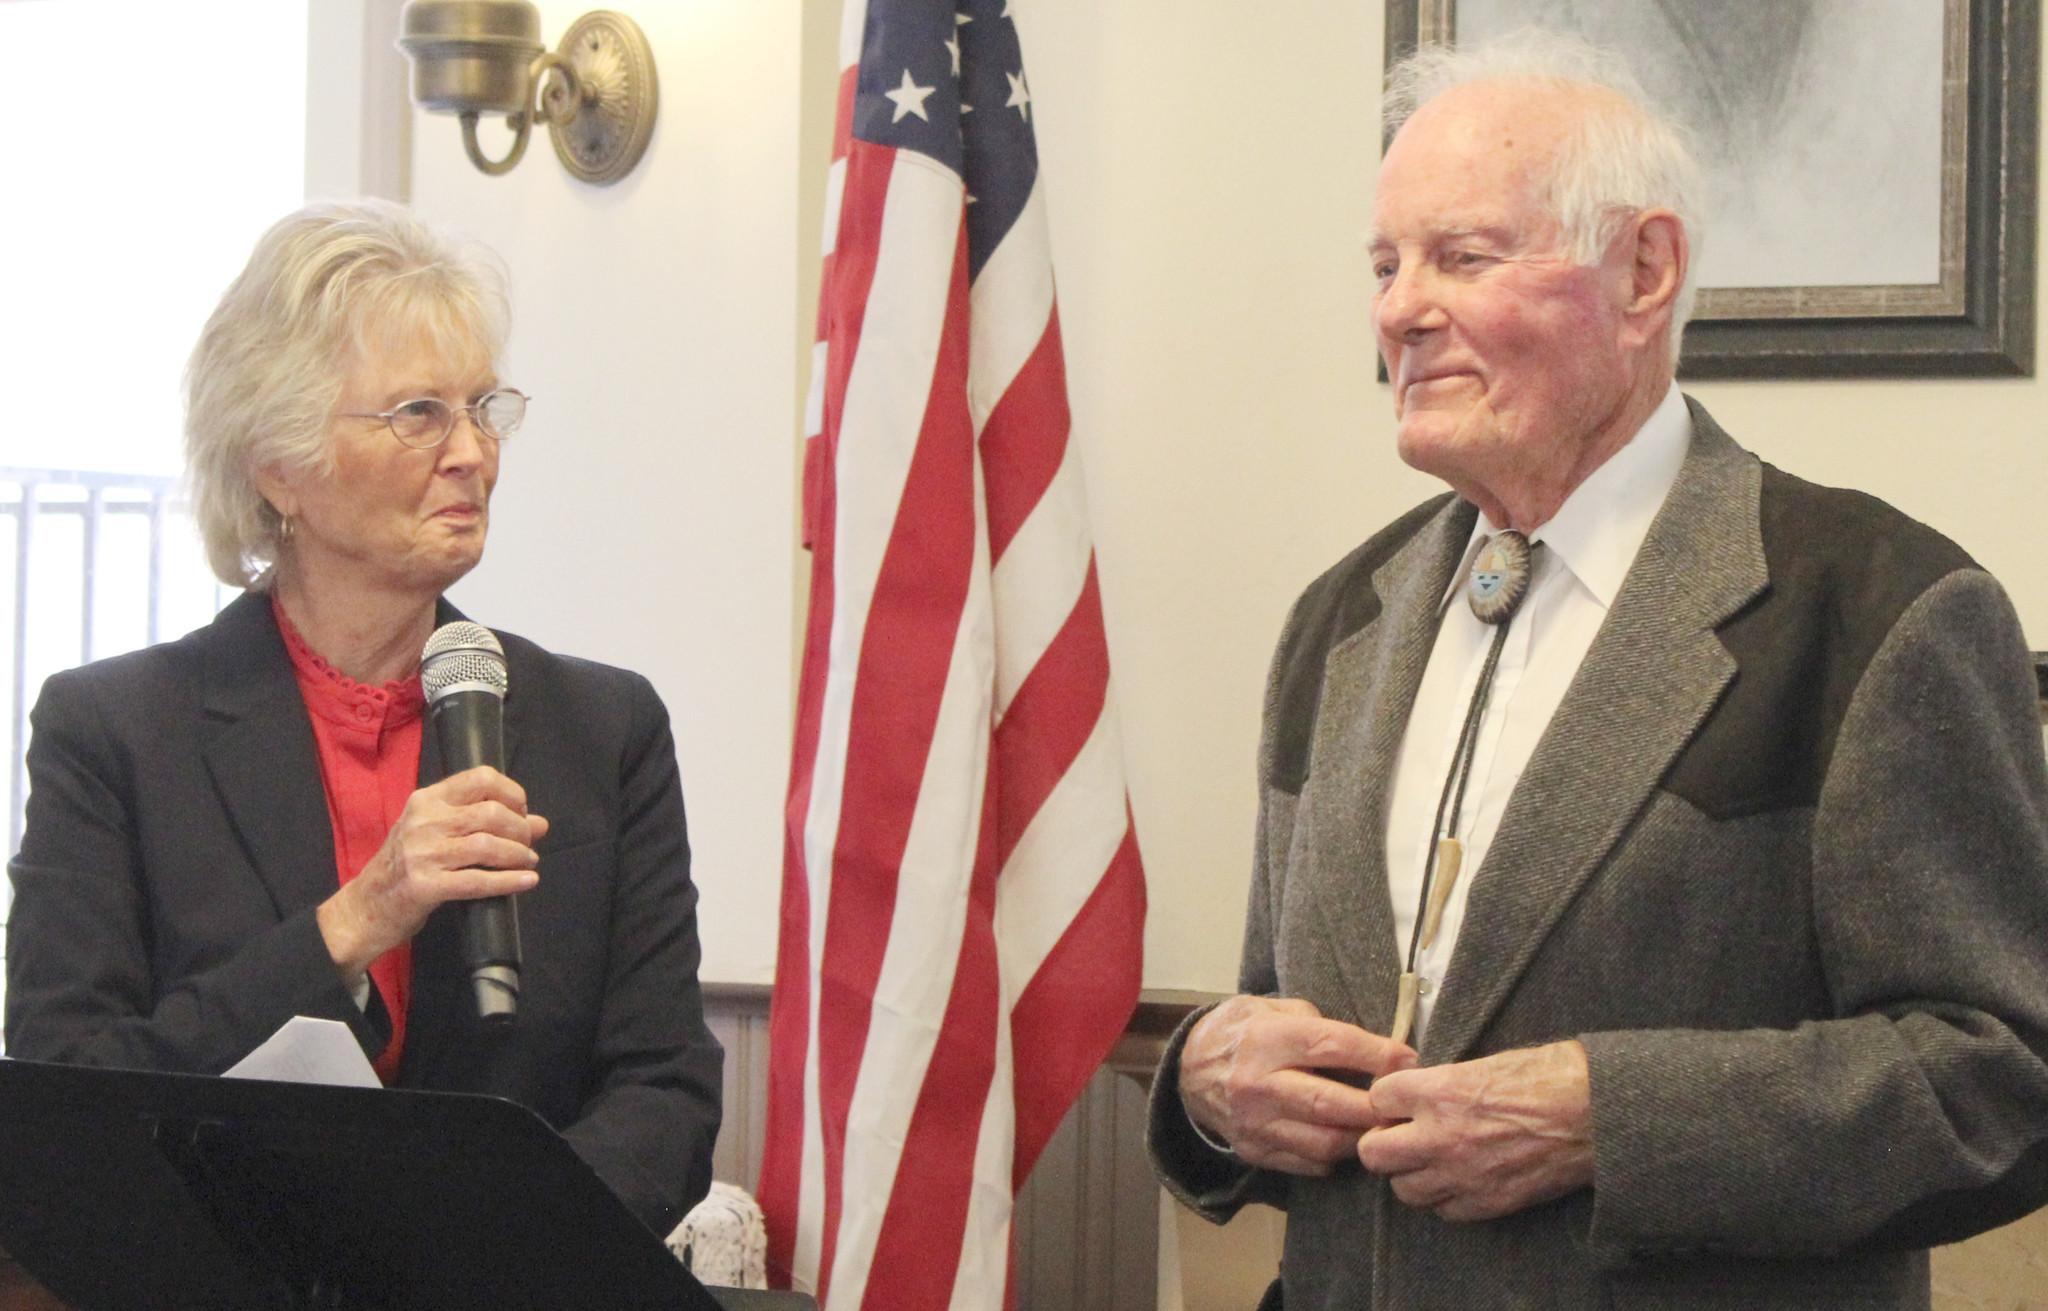 Supervisor Dianne Jacob and incoming Honorary Mayor John Degenfelder share a joke before she administers his oath of office.